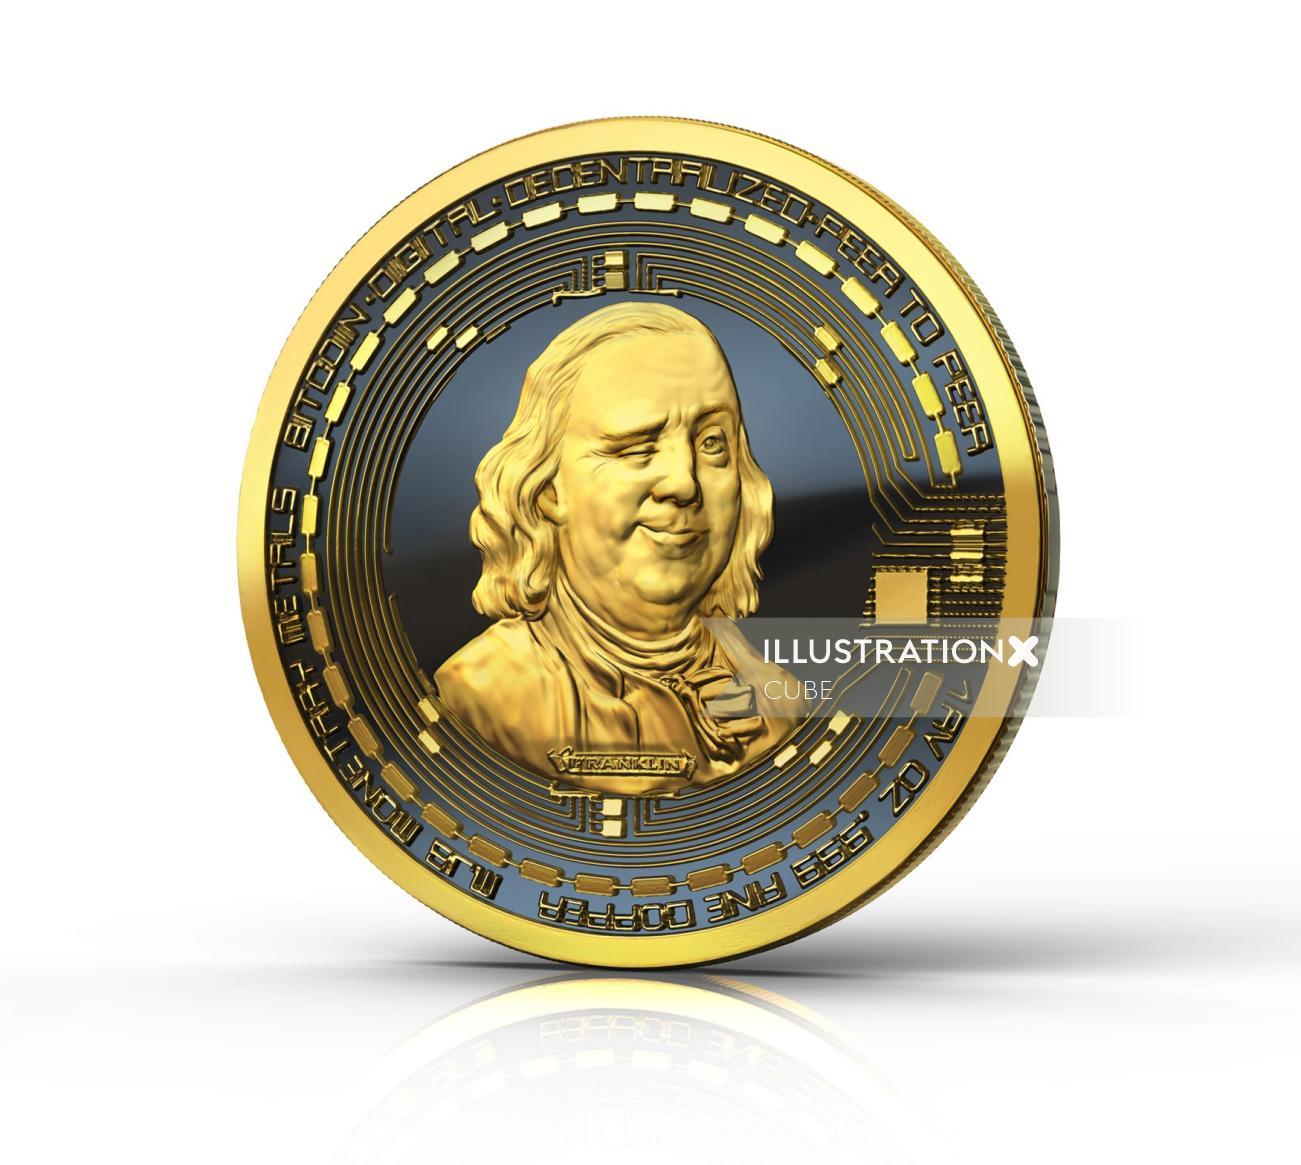 Benjamin Franklin BitCoin illustration for US magazine feature